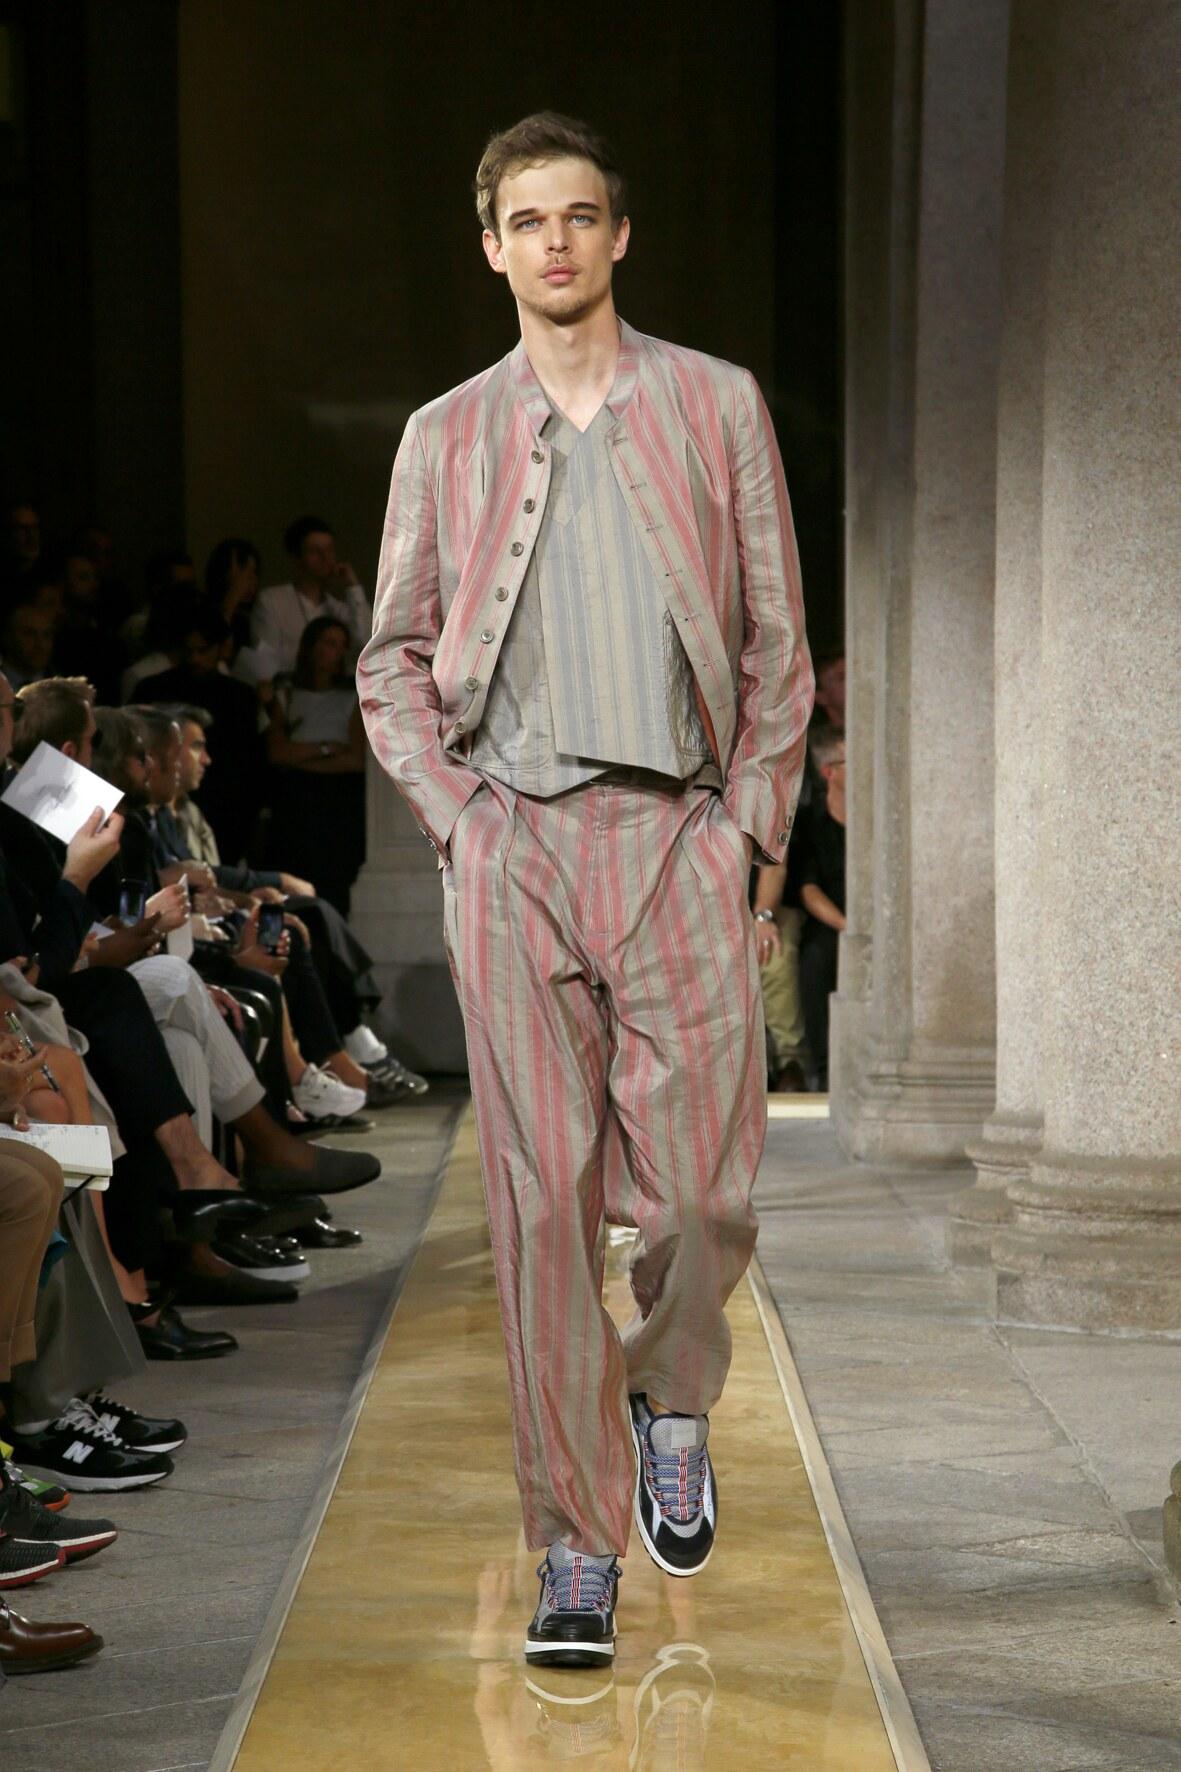 SS 2020 Giorgio Armani Show Milan Fashion Week Menswear